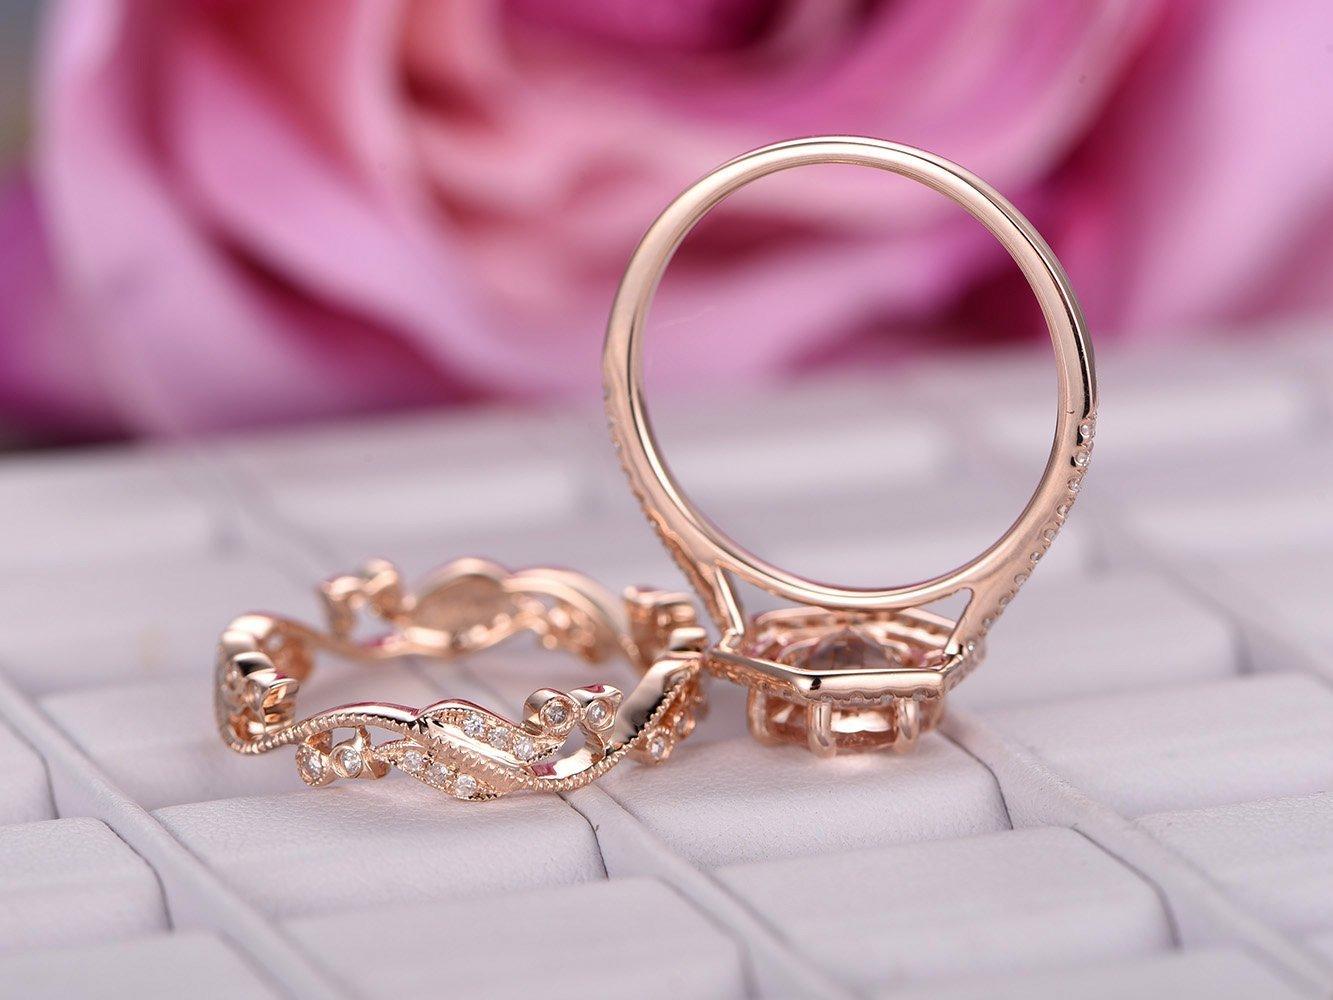 Amazon.com: Round Morganite Engagement Ring Set Pave Diamond Wedding ...